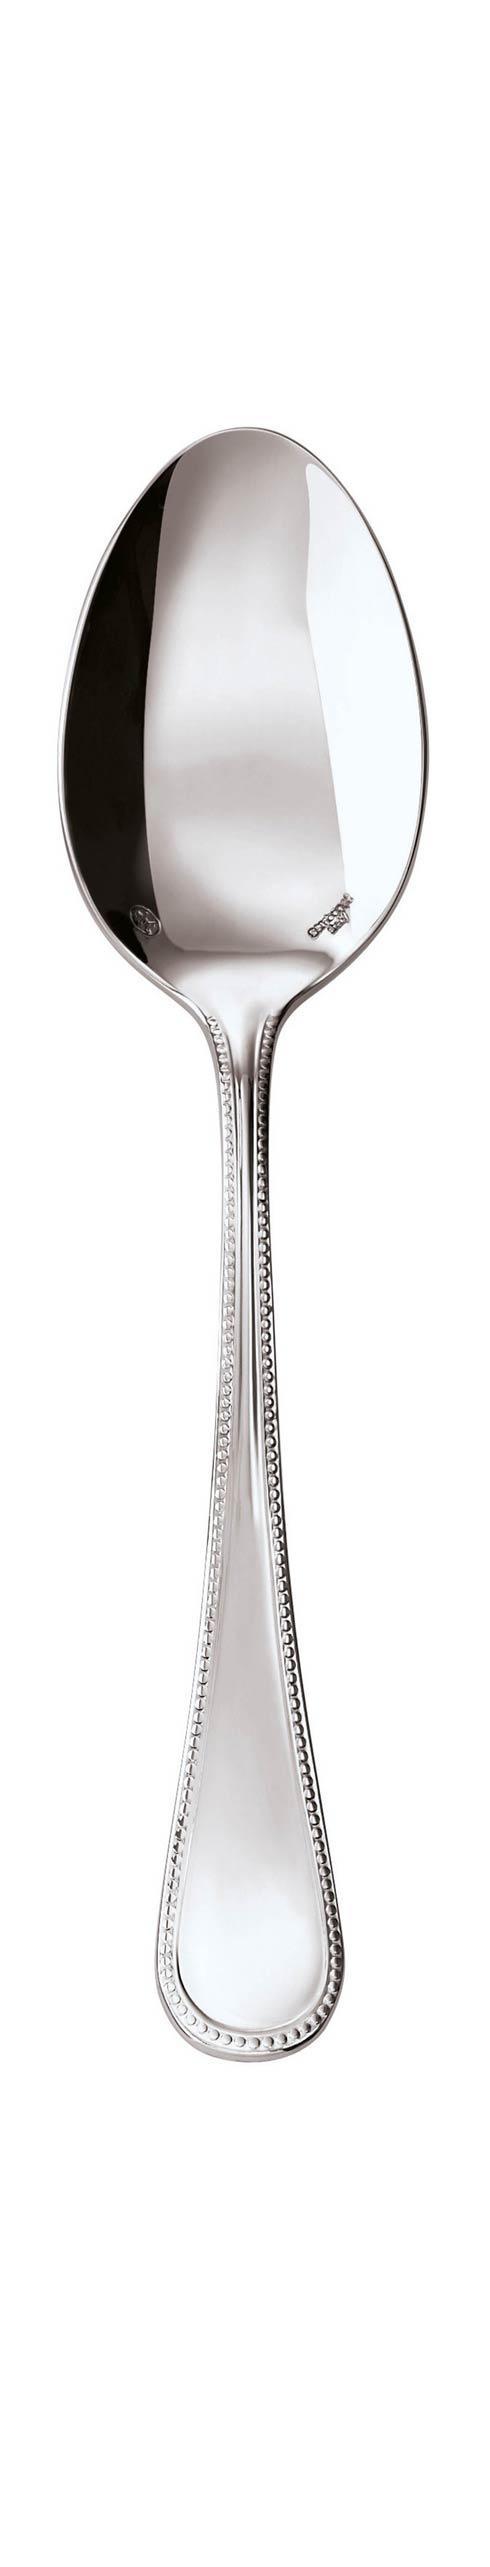 Sambonet  Perles  Dessert Spoon $12.00